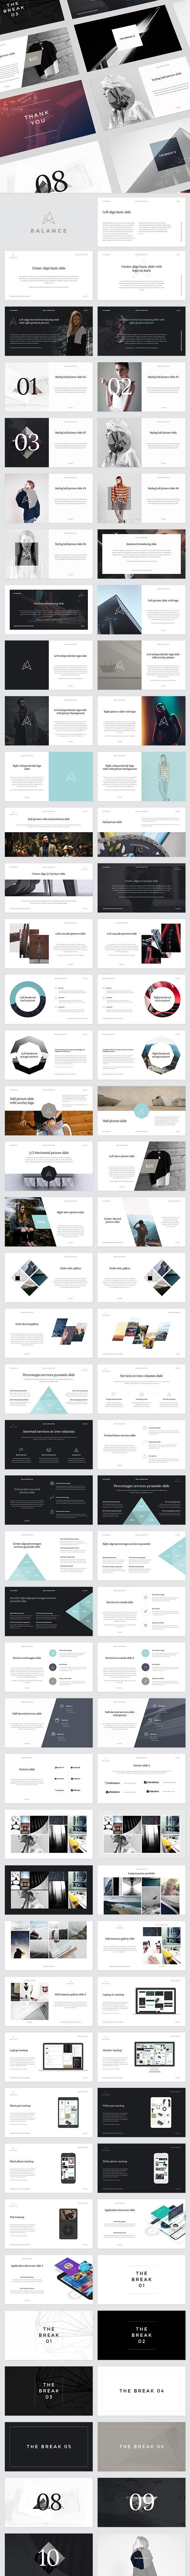 Balance PowerPoint Presentation - Creative PowerPoint Templates